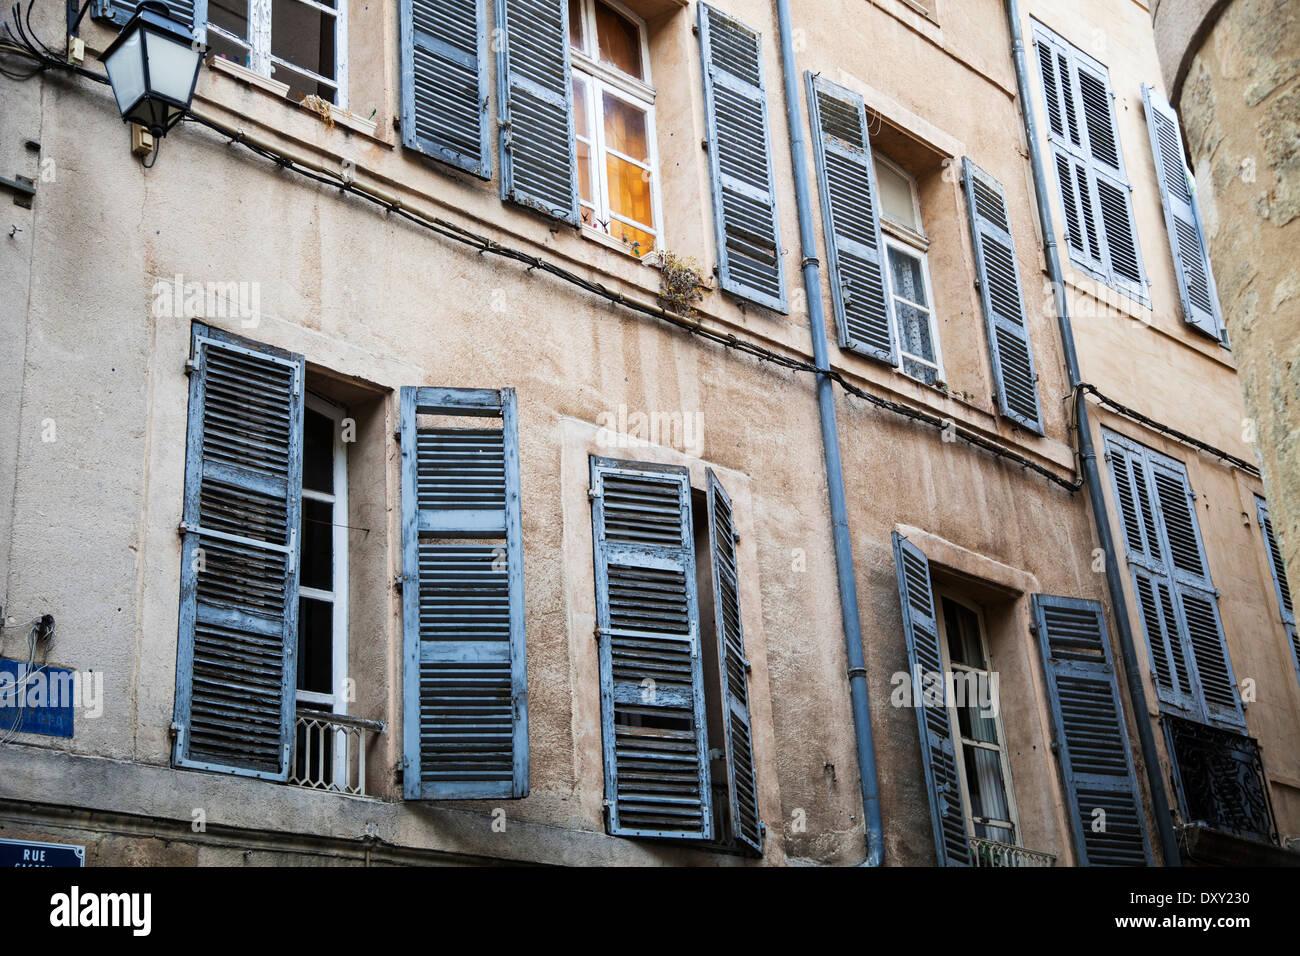 Blue shuttered windows in Aix en Provence - Stock Image